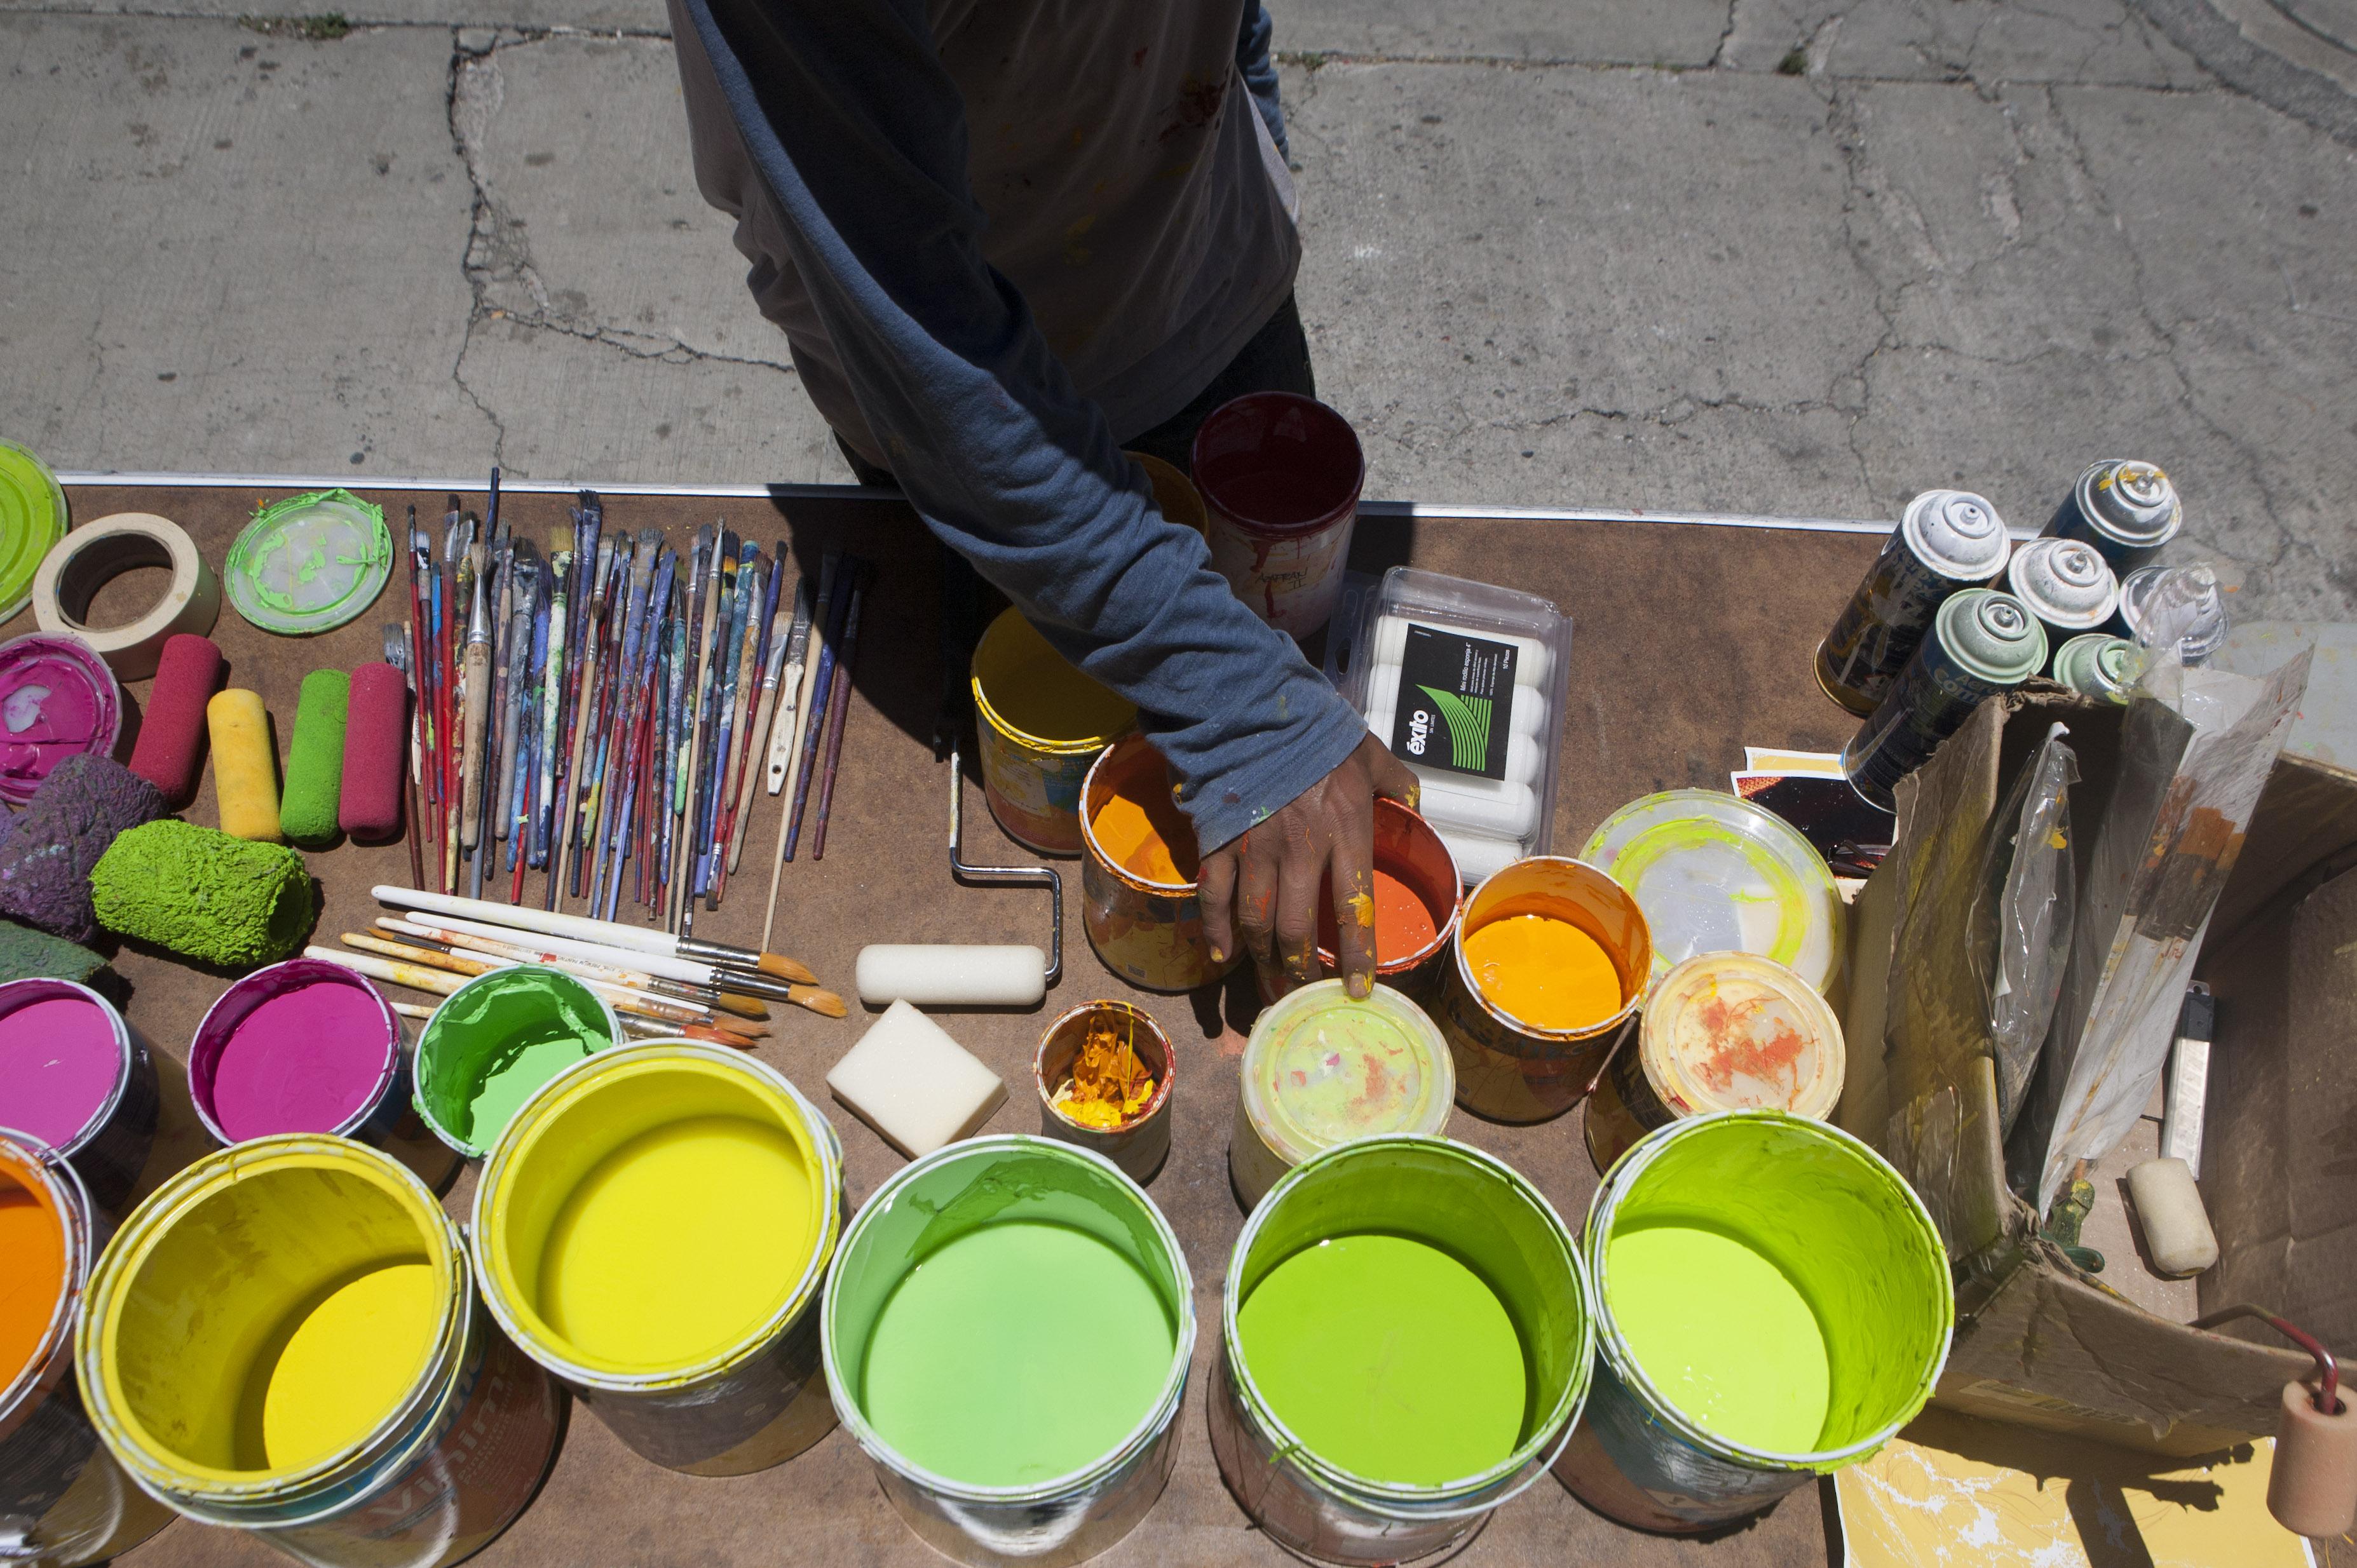 4_Street-Art-Eliminate-Crime-in-Mexico